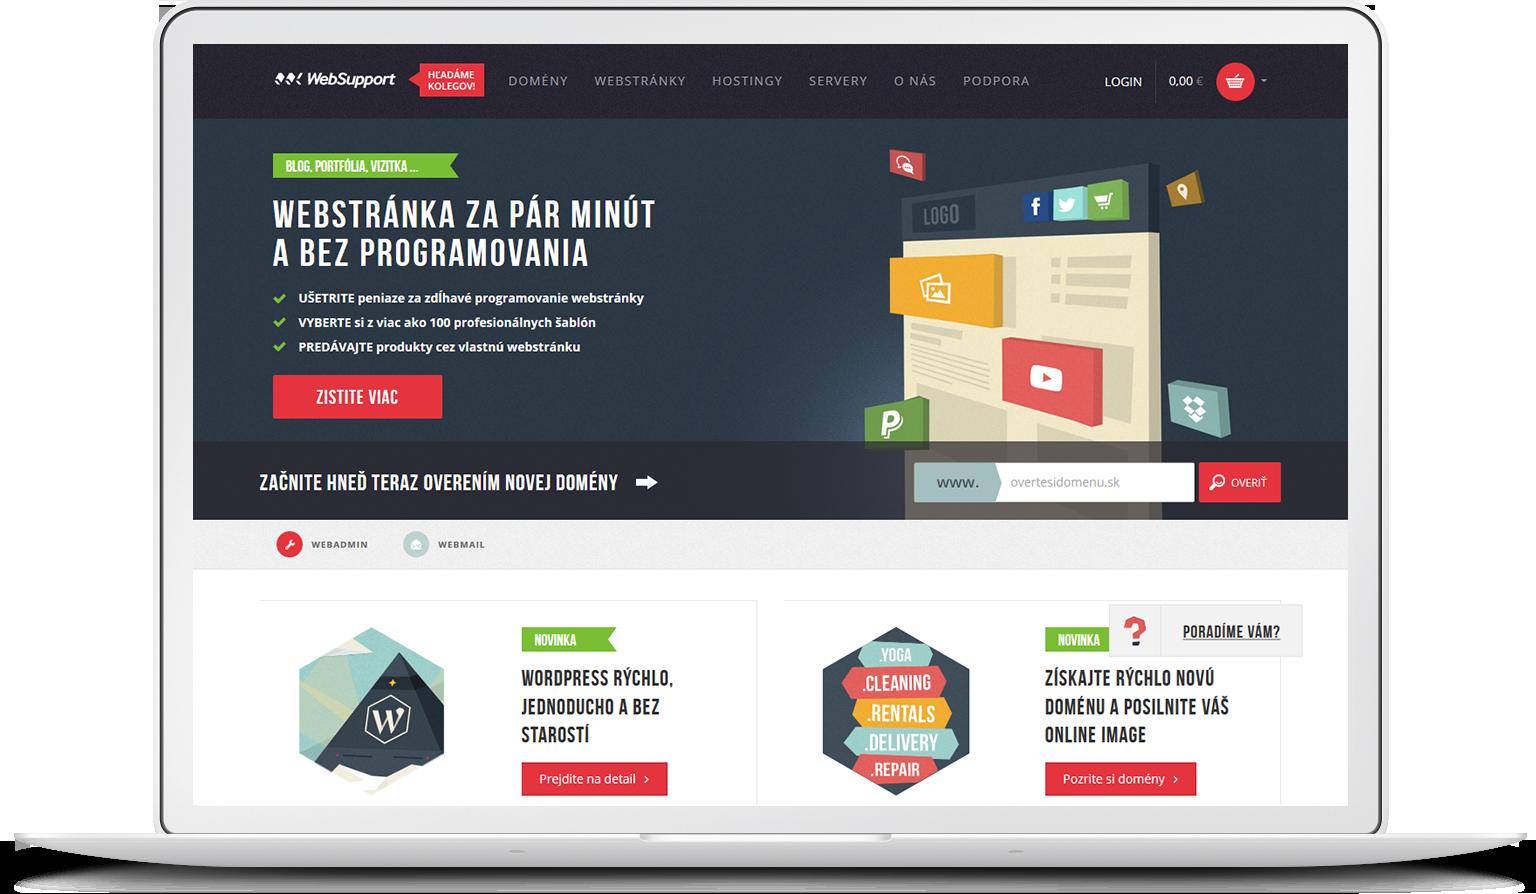 Websupport success story hero image